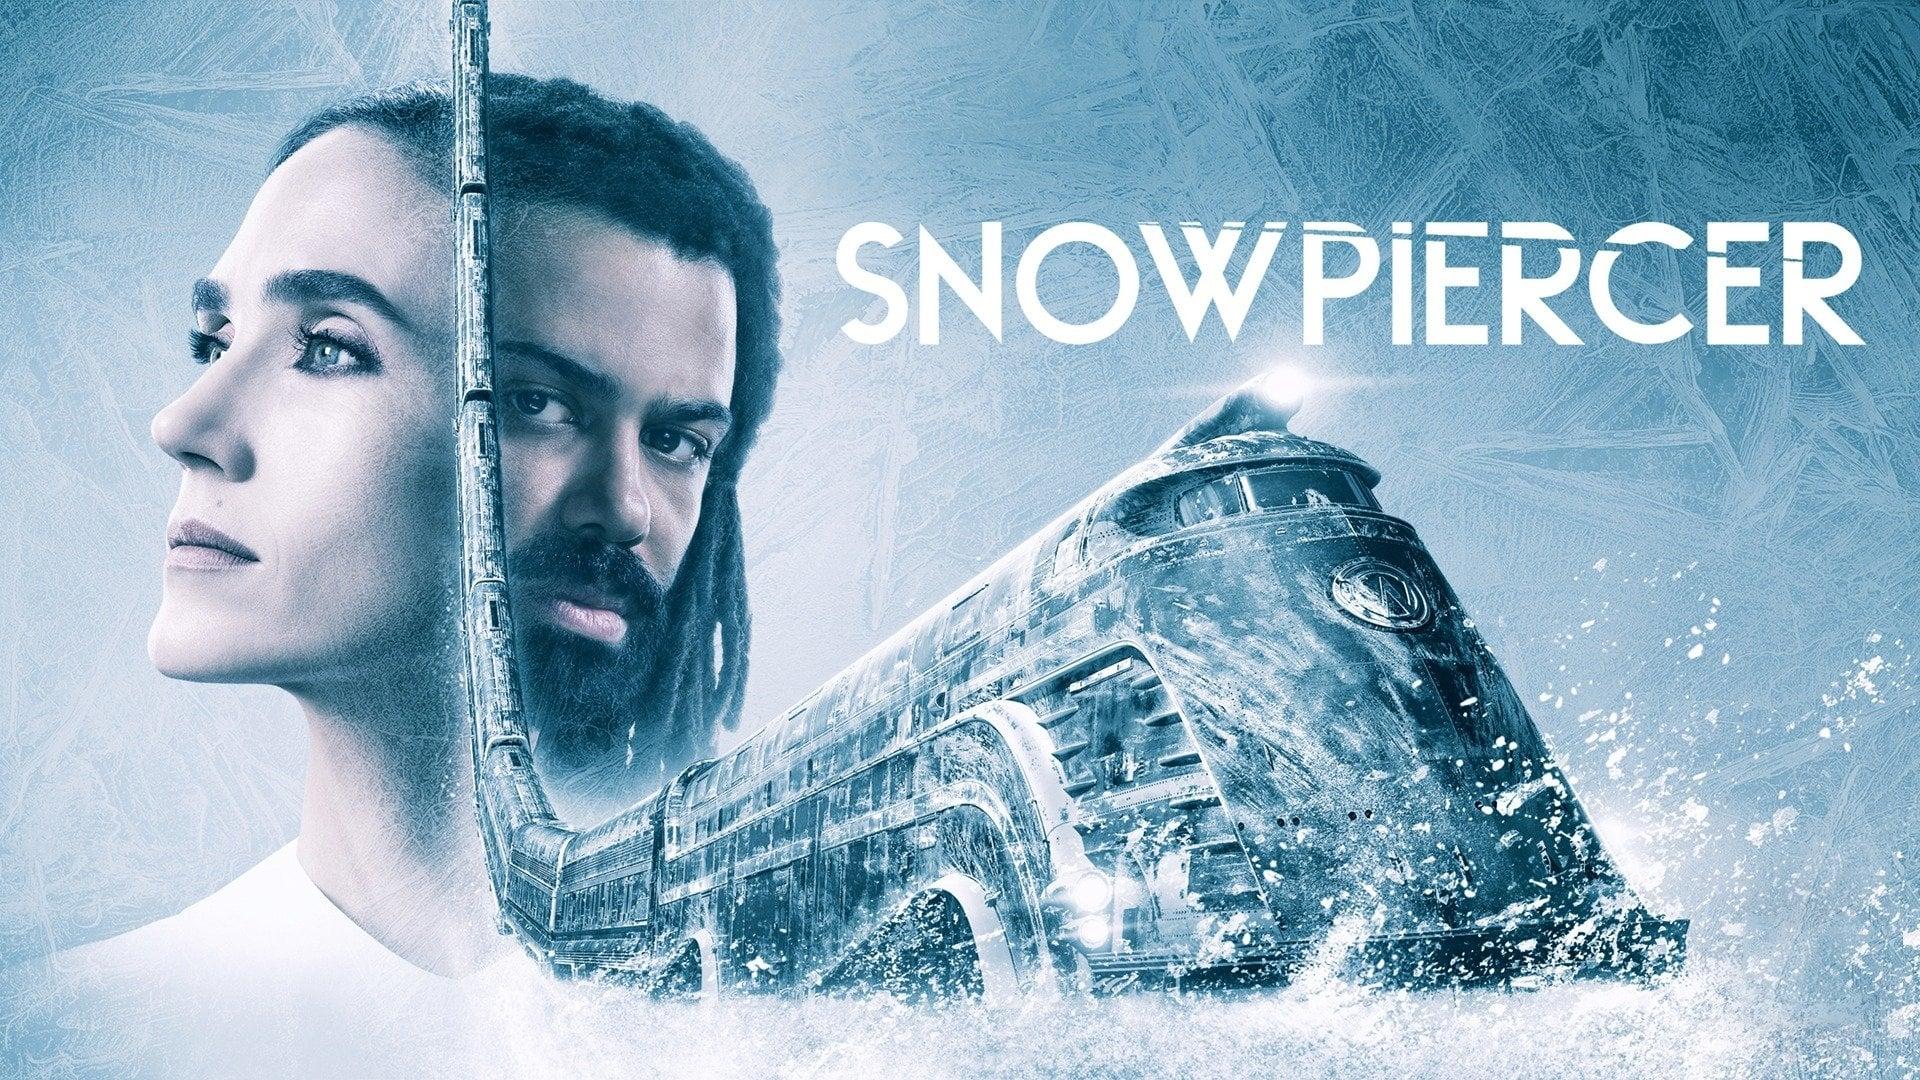 Snowpiercer Season 2 Episode 2